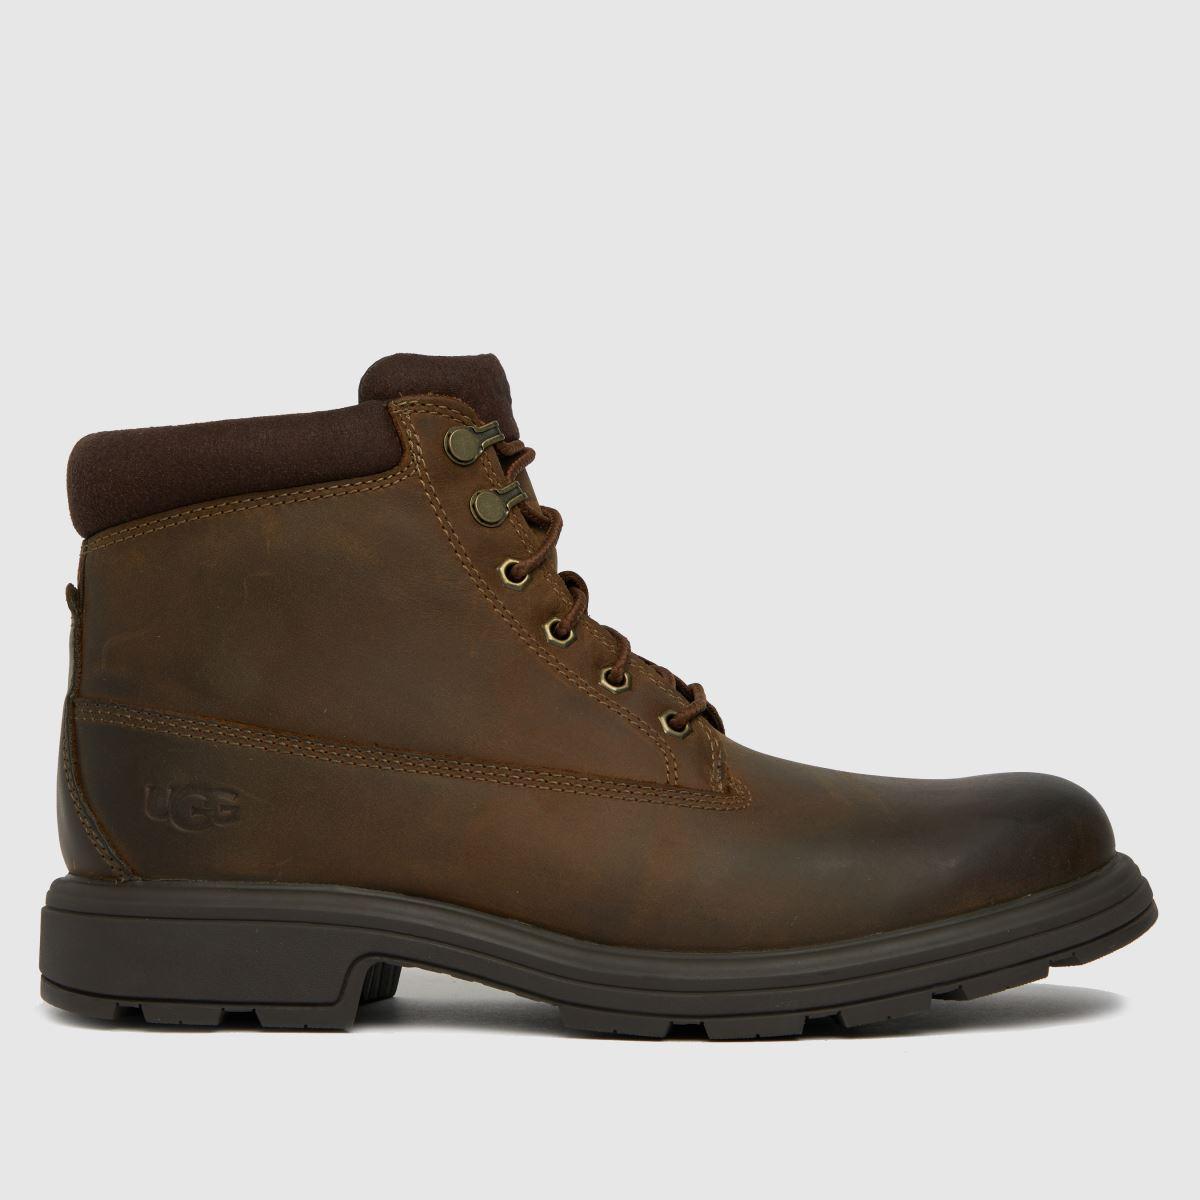 UGG Brown Biltmore Boot Wp Boots